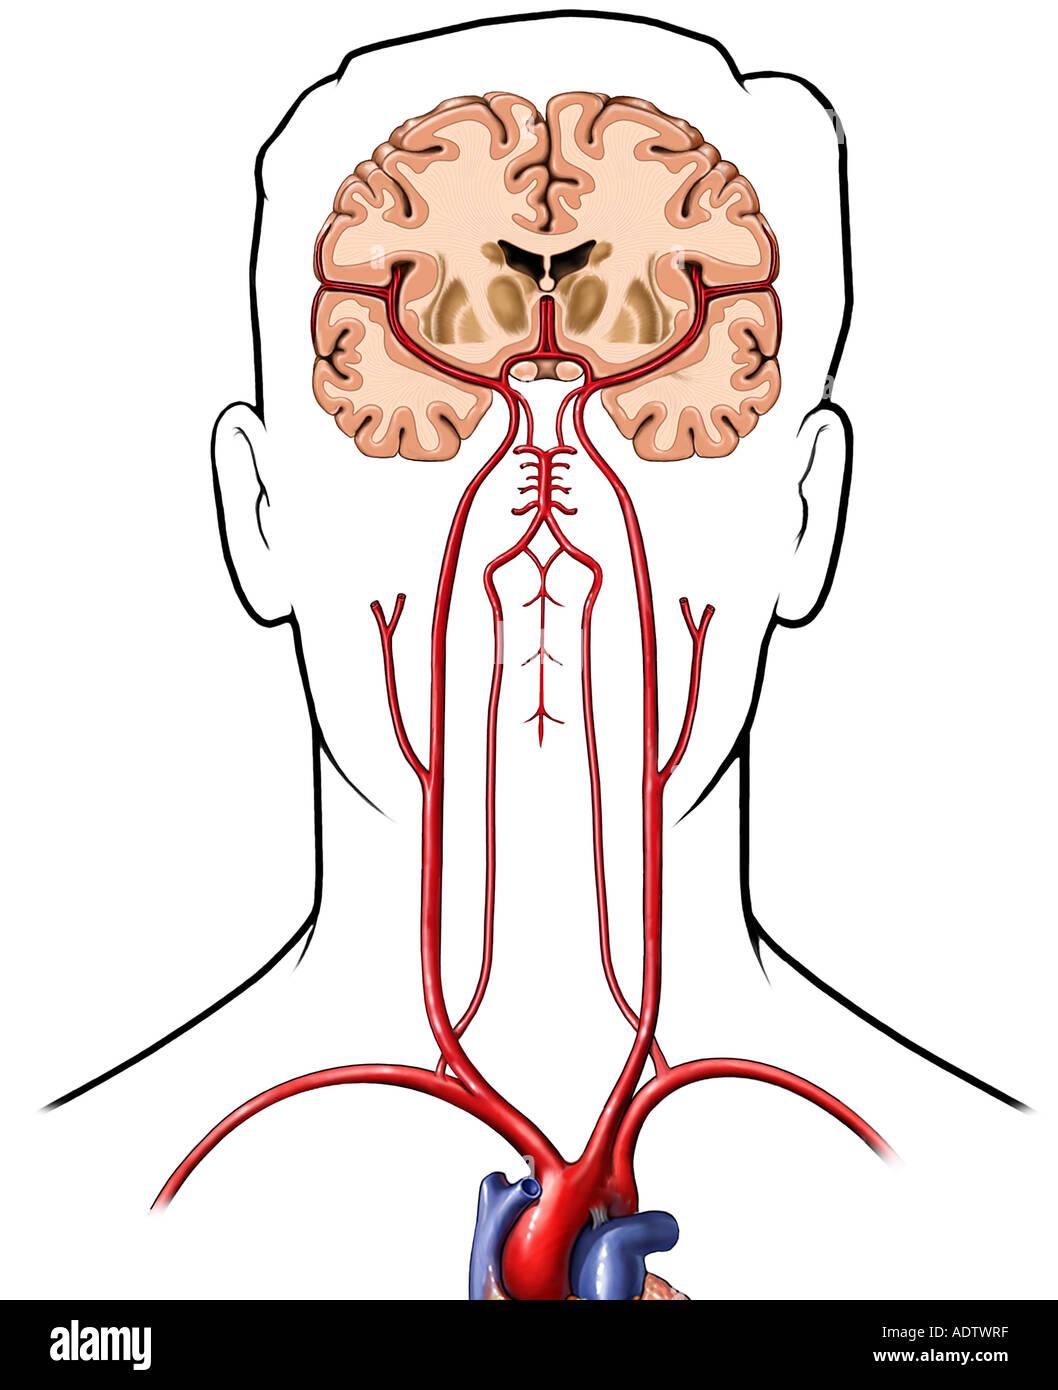 Durchblutung Gehirn